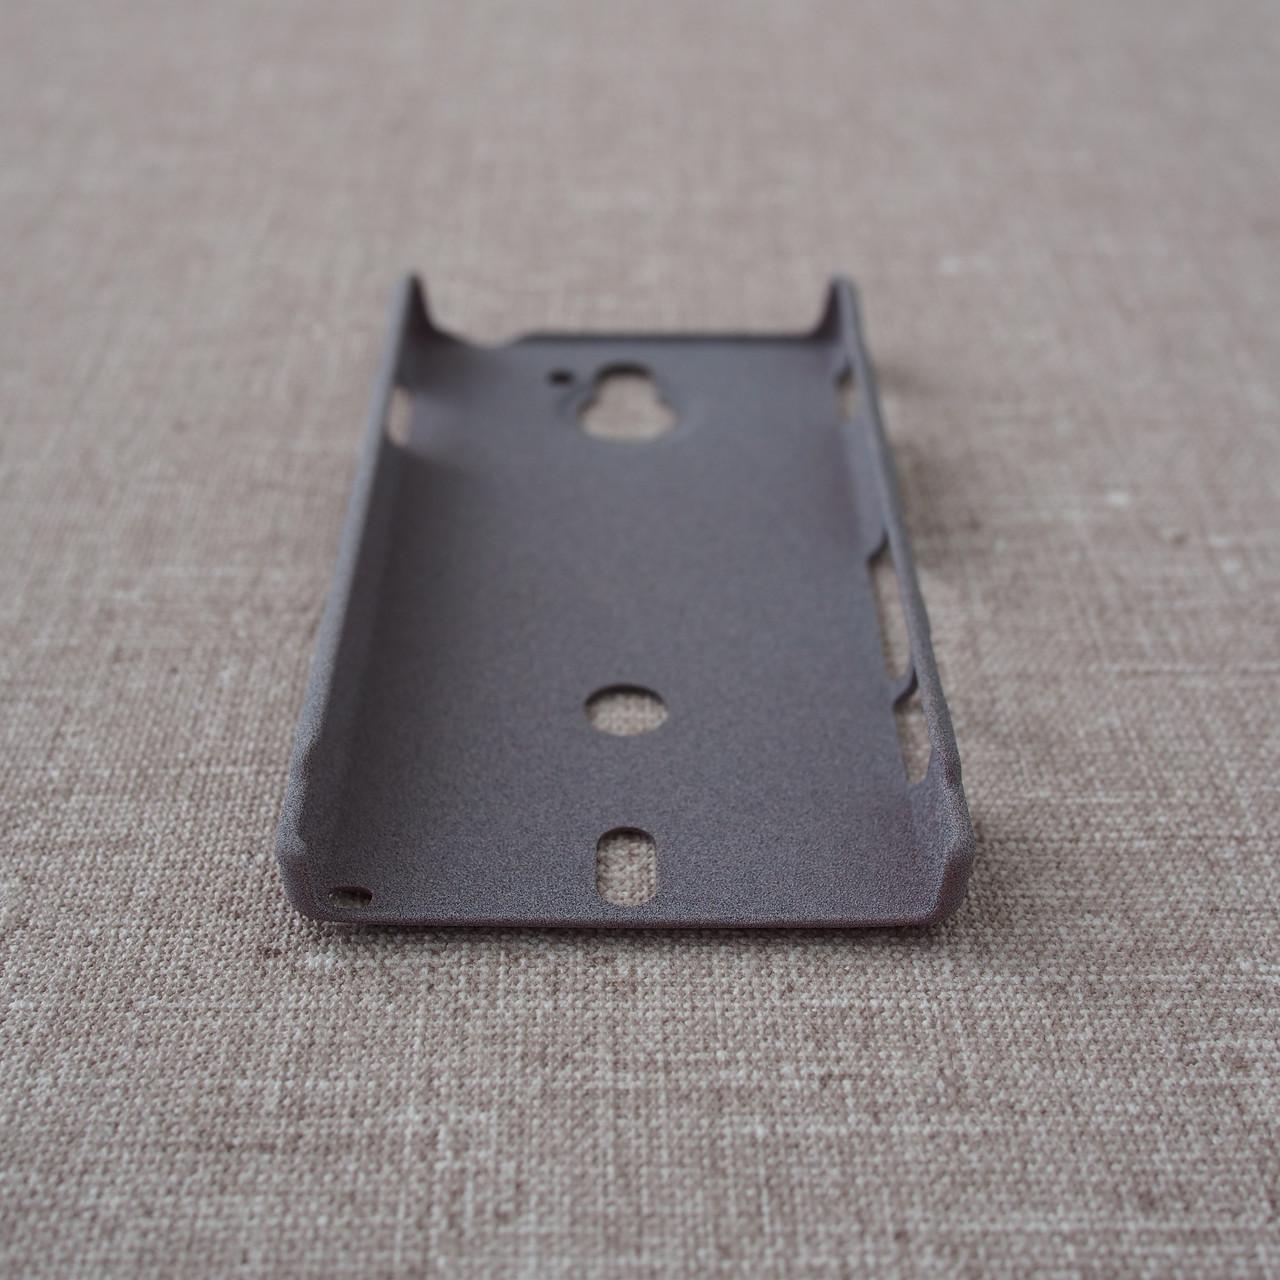 ROCK Quicksand Sony Xperia Sola Для телефона